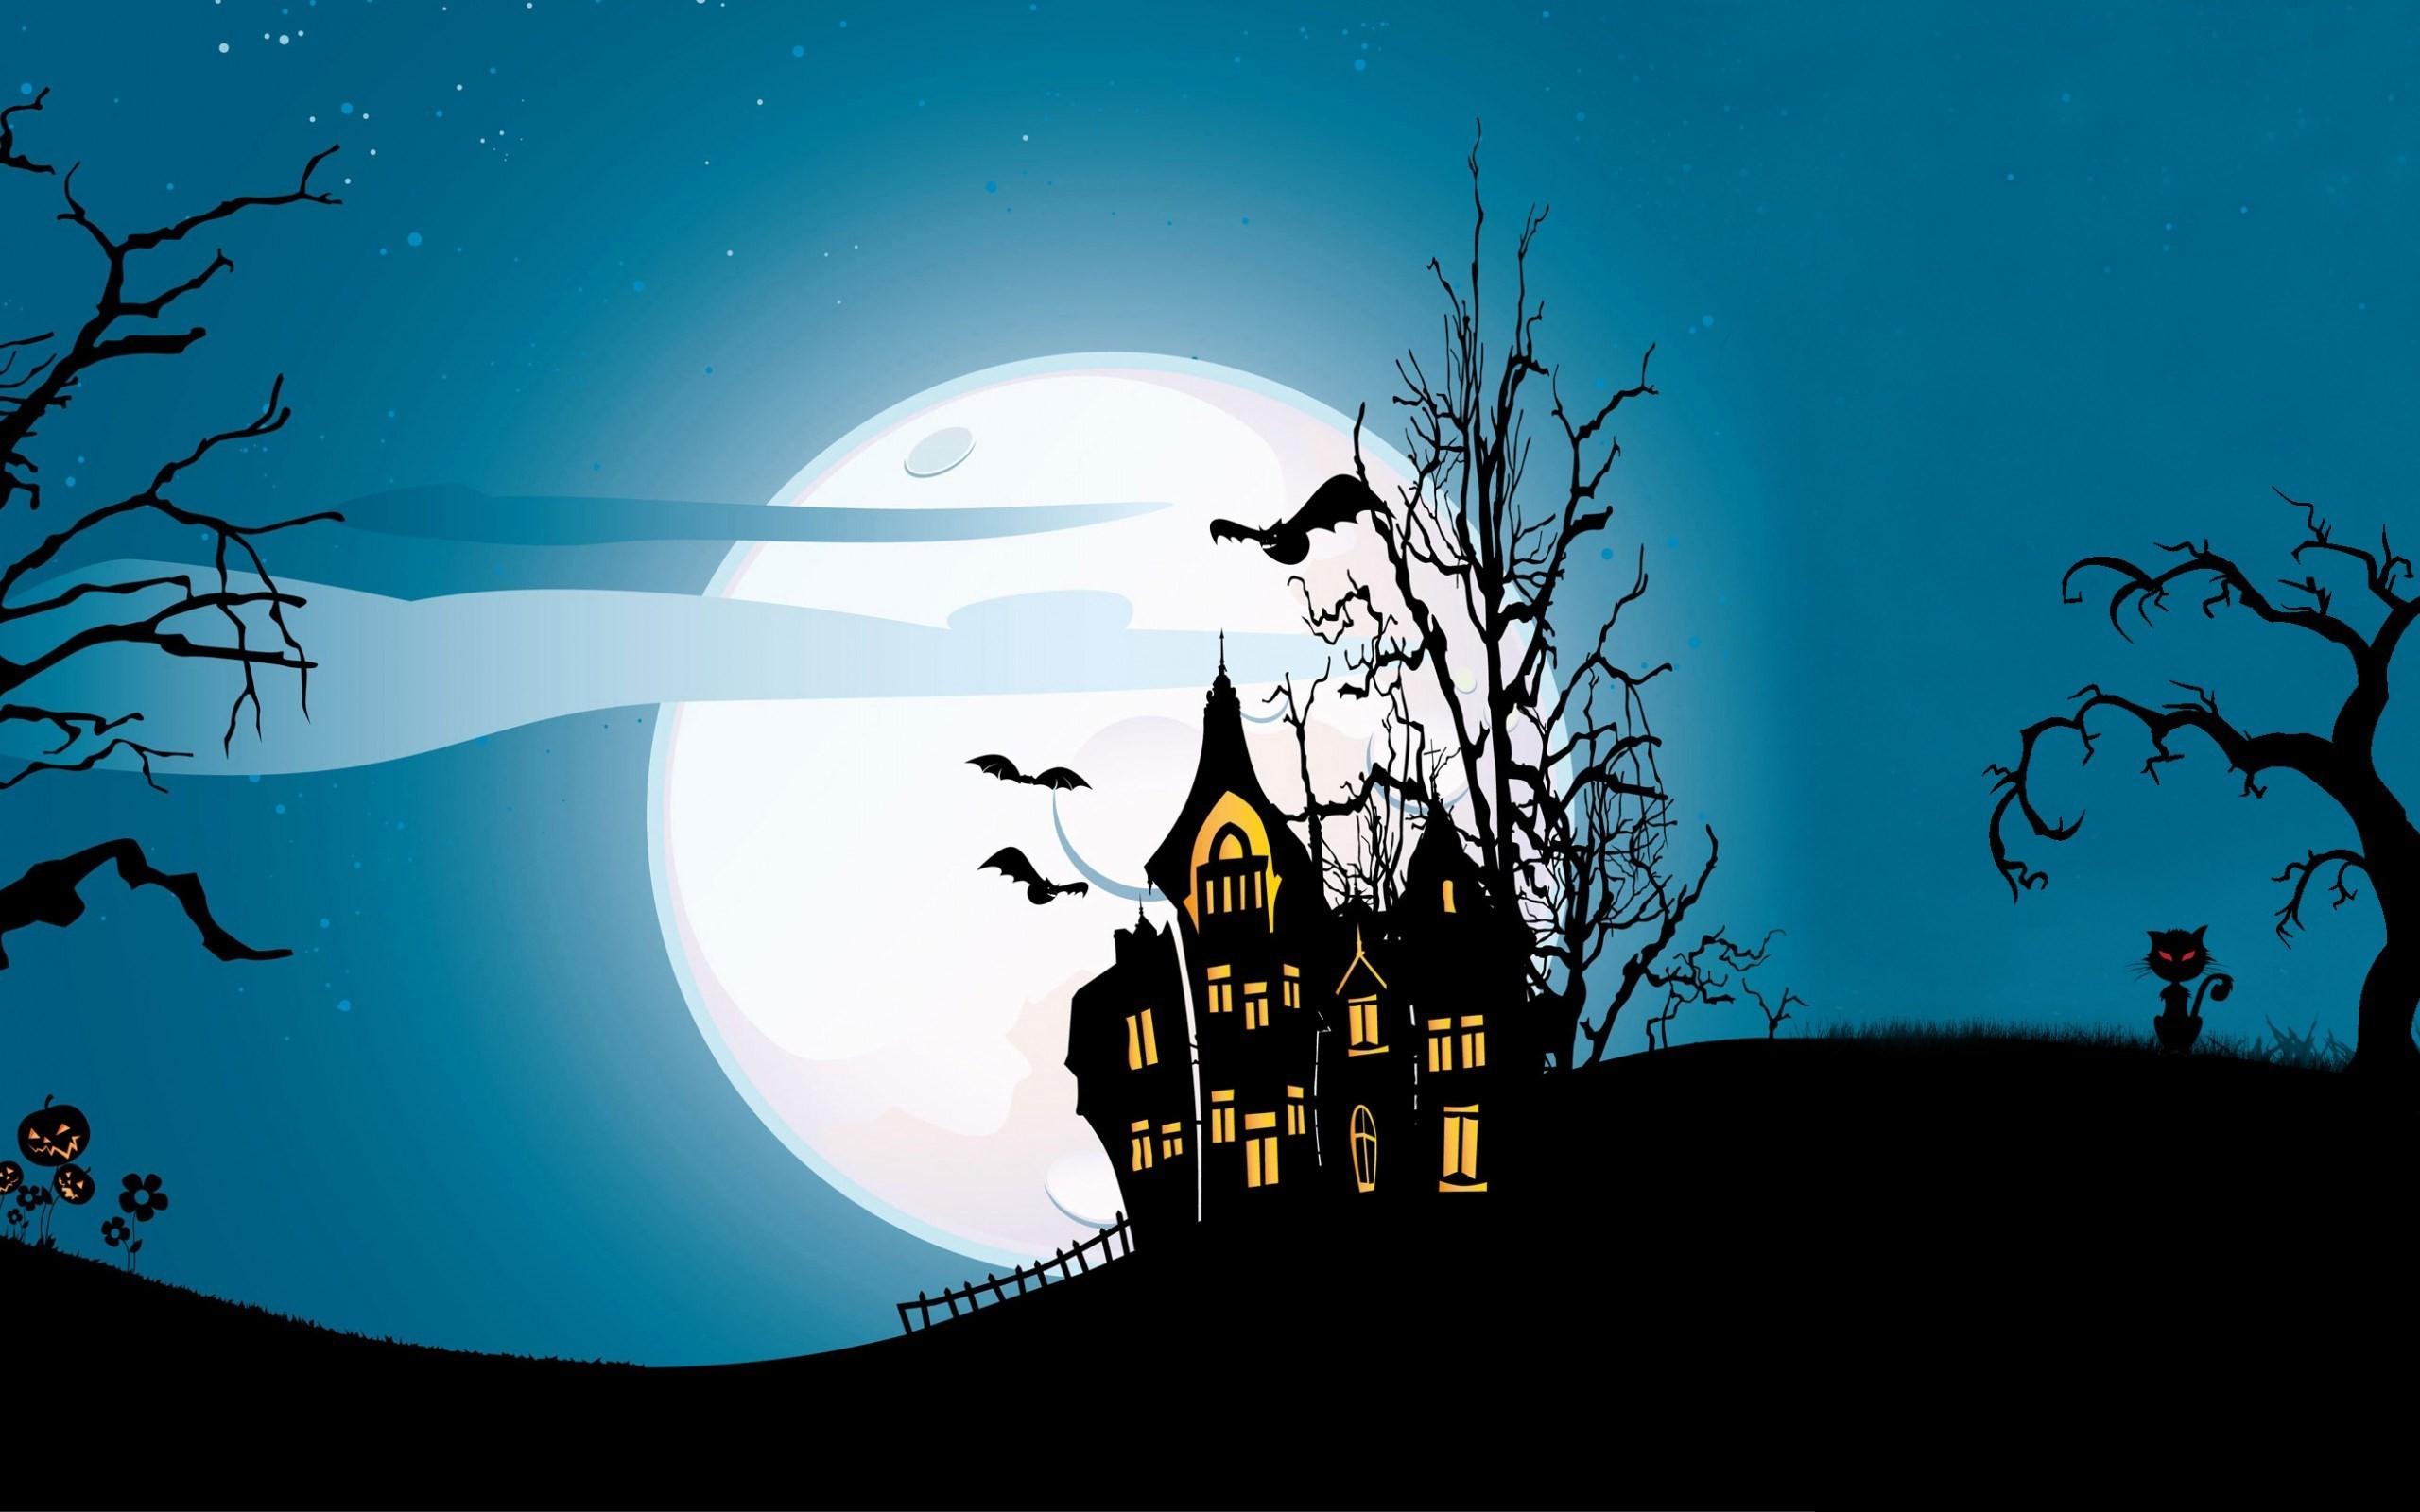 Halloween Creepy Scary Pumpkins Bats House Full Moon Midnight. 2560×1600.  Hd Wallpaper